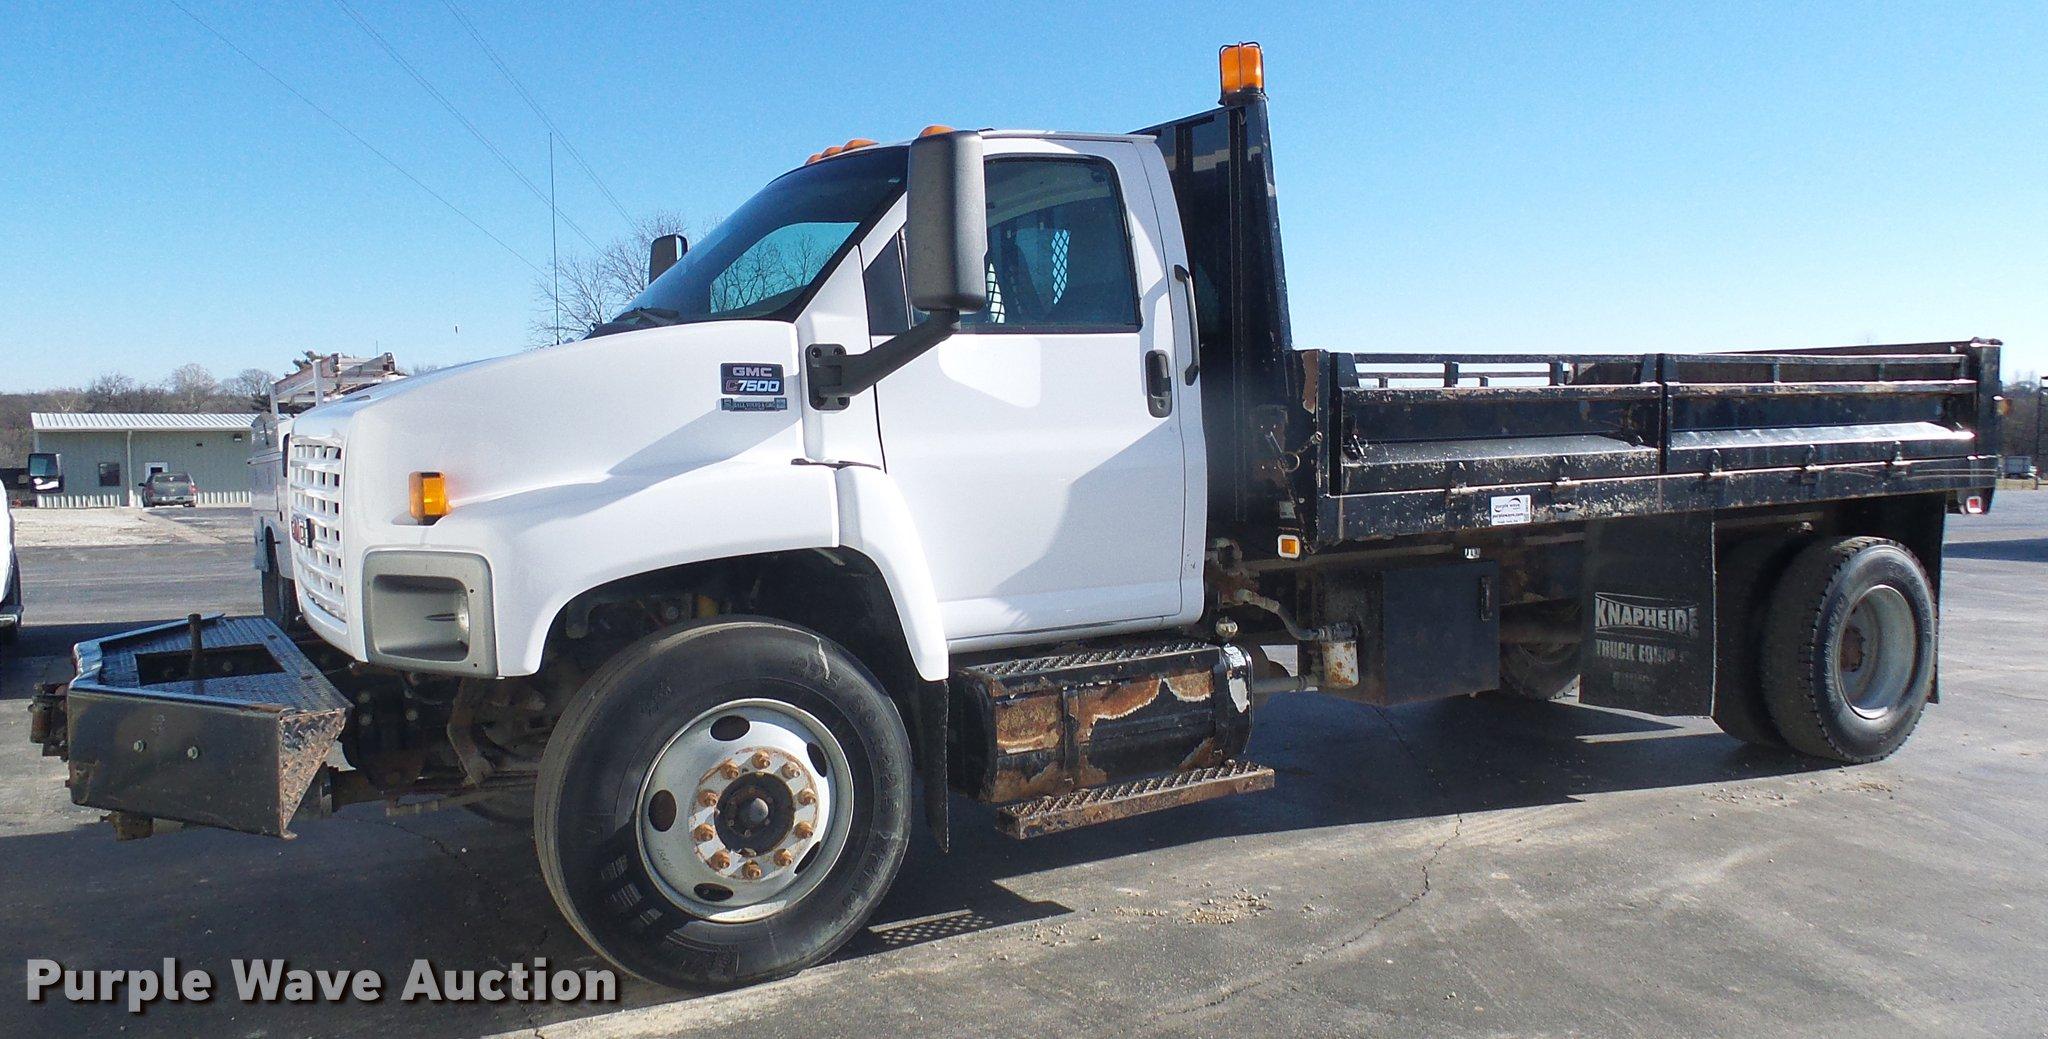 2005 GMC C7500 dump truck | Item DB2161 | SOLD! February 14